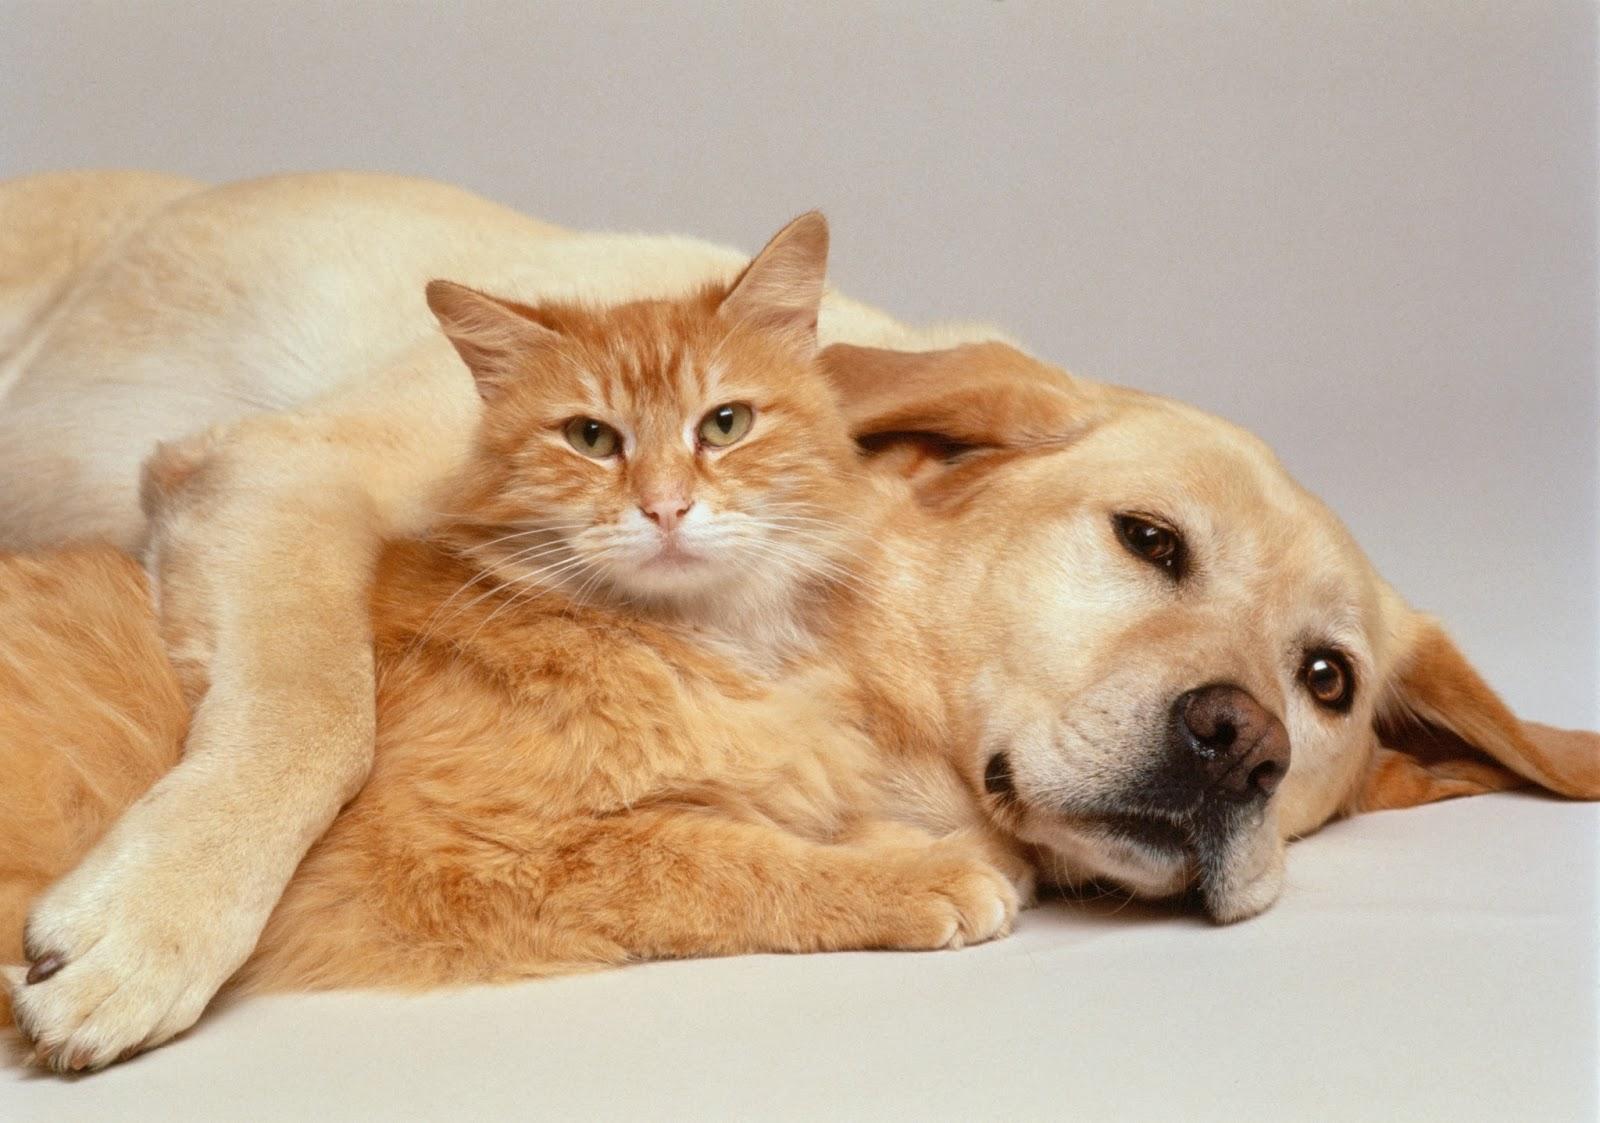 Cute Cat With Cute Dog Wallpaper for Desktop 1600x1123